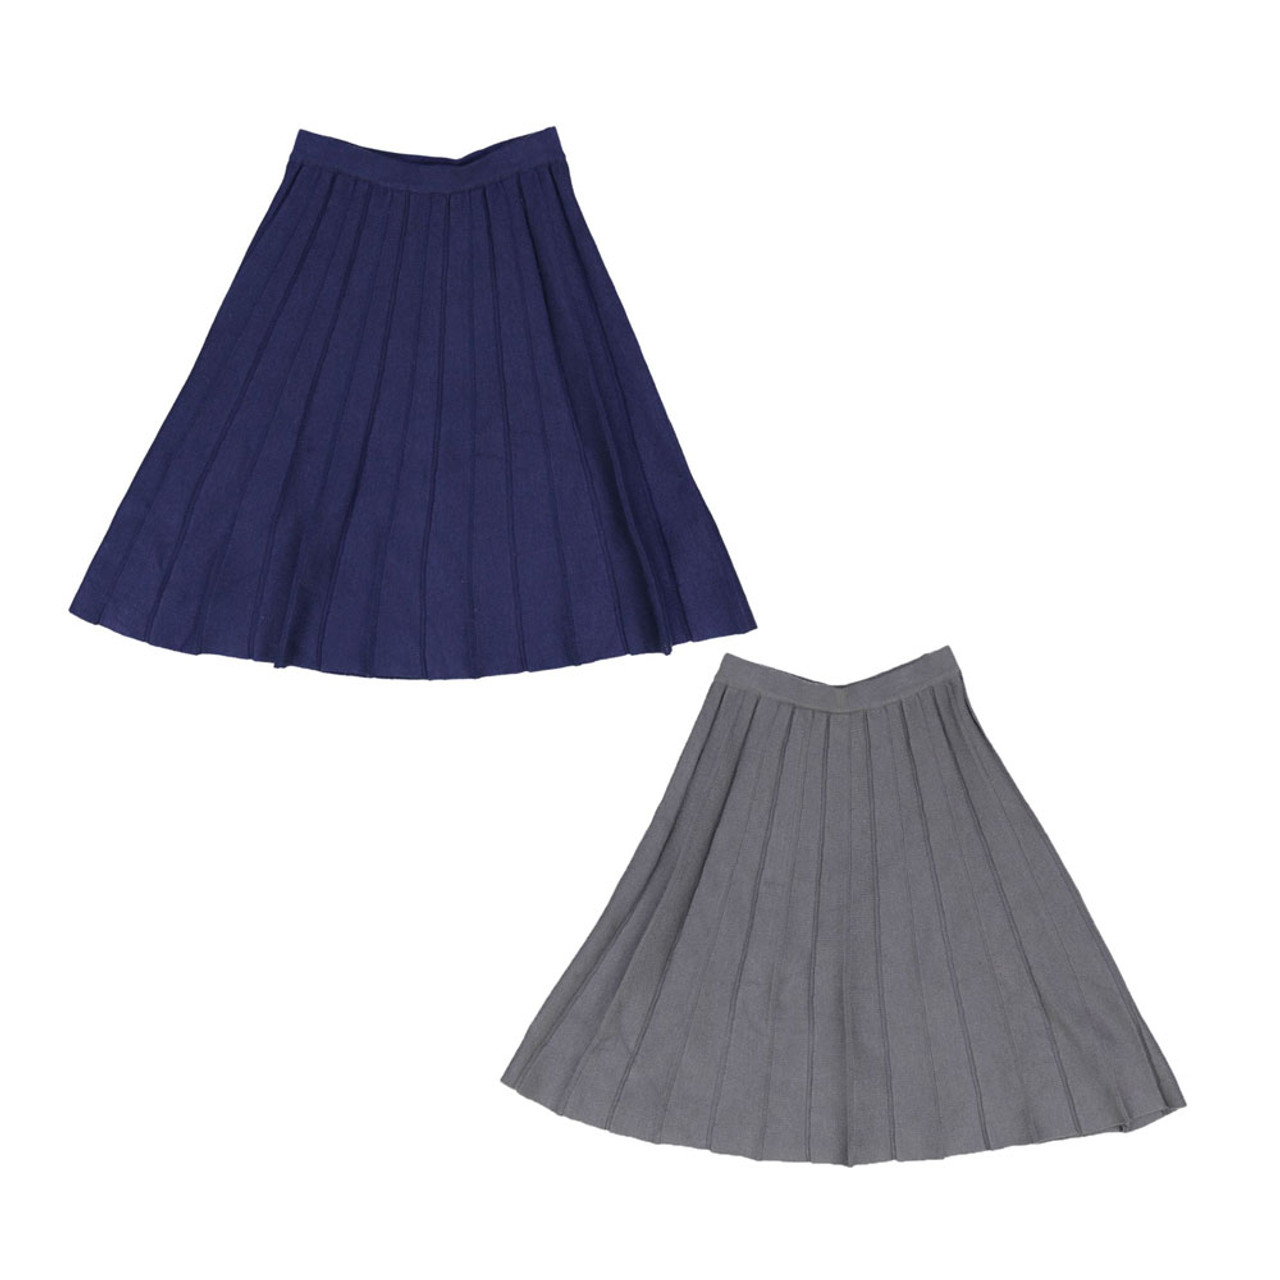 BGDK Girls Panel Knit Skirt